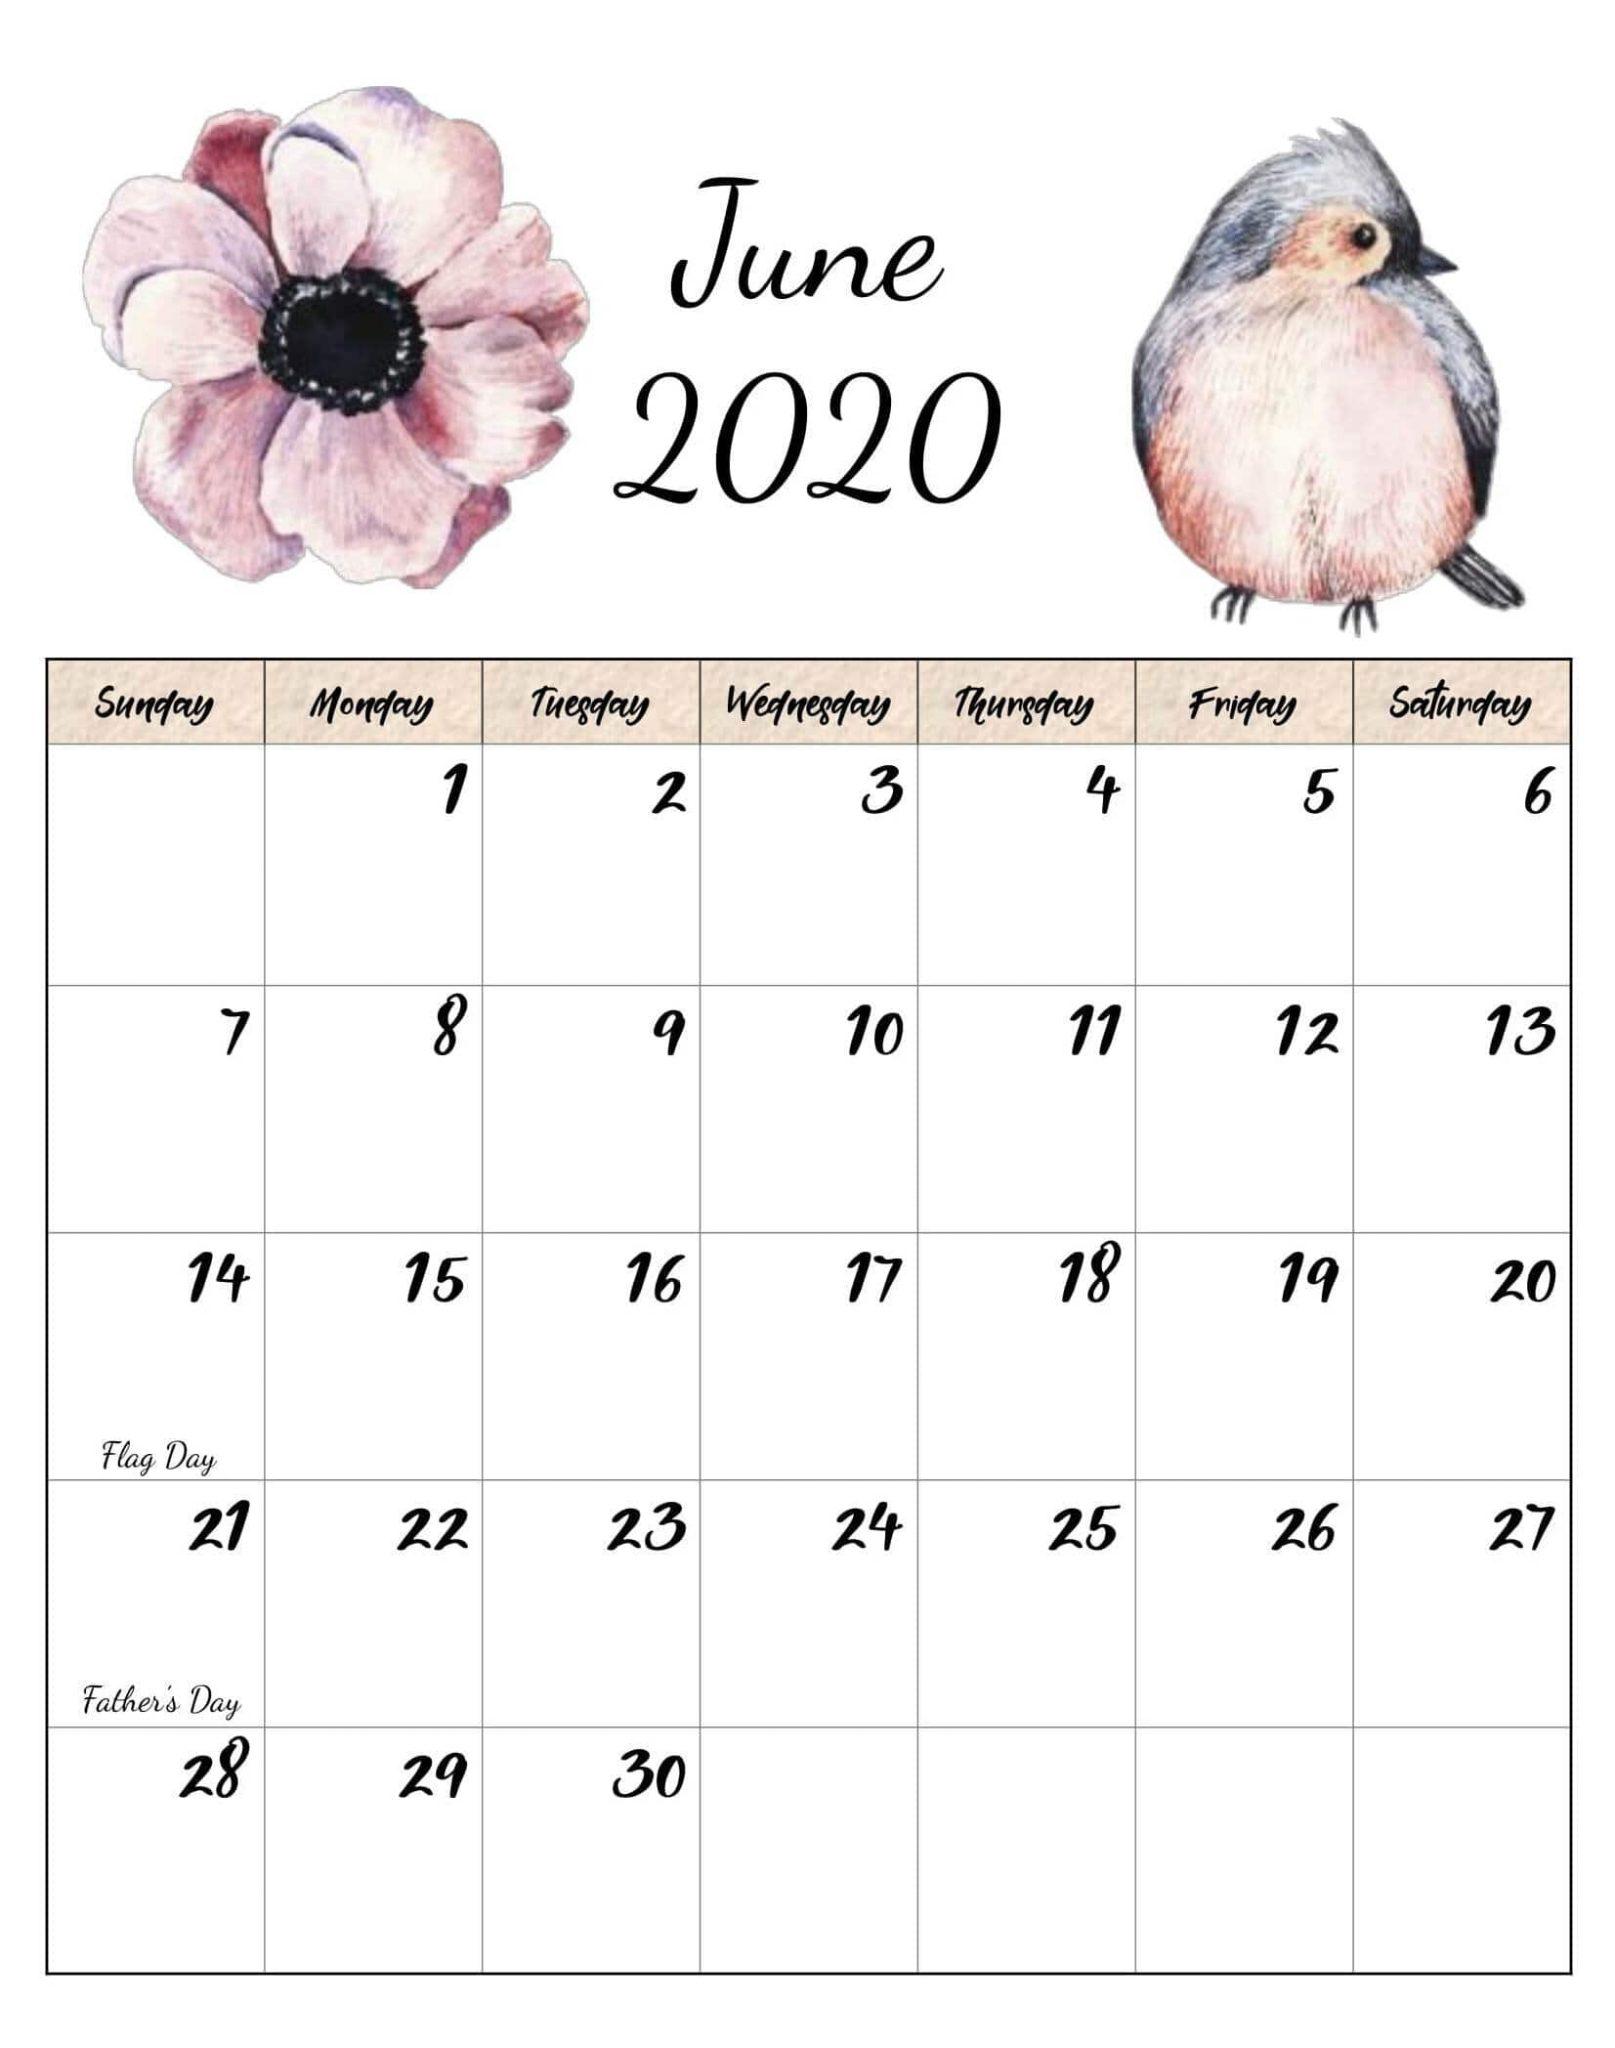 June 2020 Cute Calendar For Desk